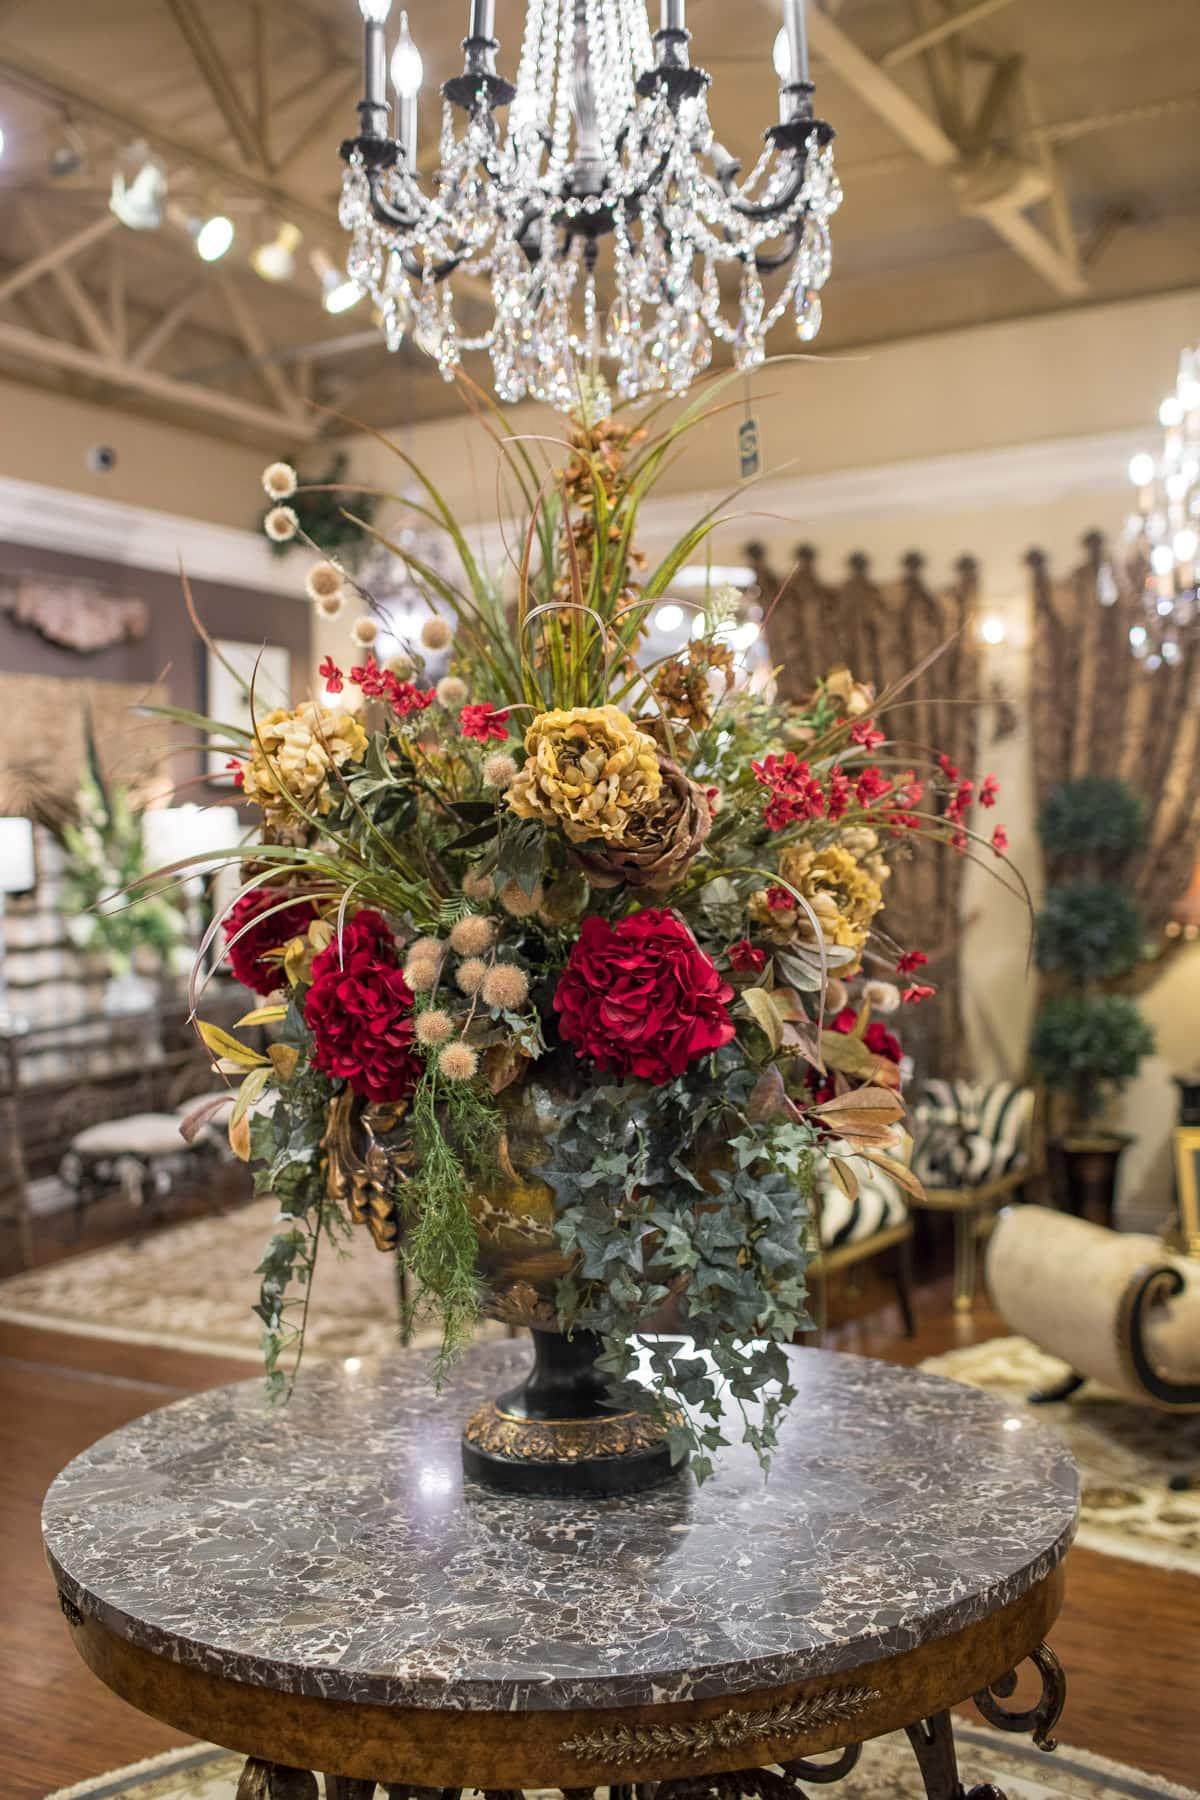 Foyer Table Floral Arrangements : Silk floral seasonal decor linly designs